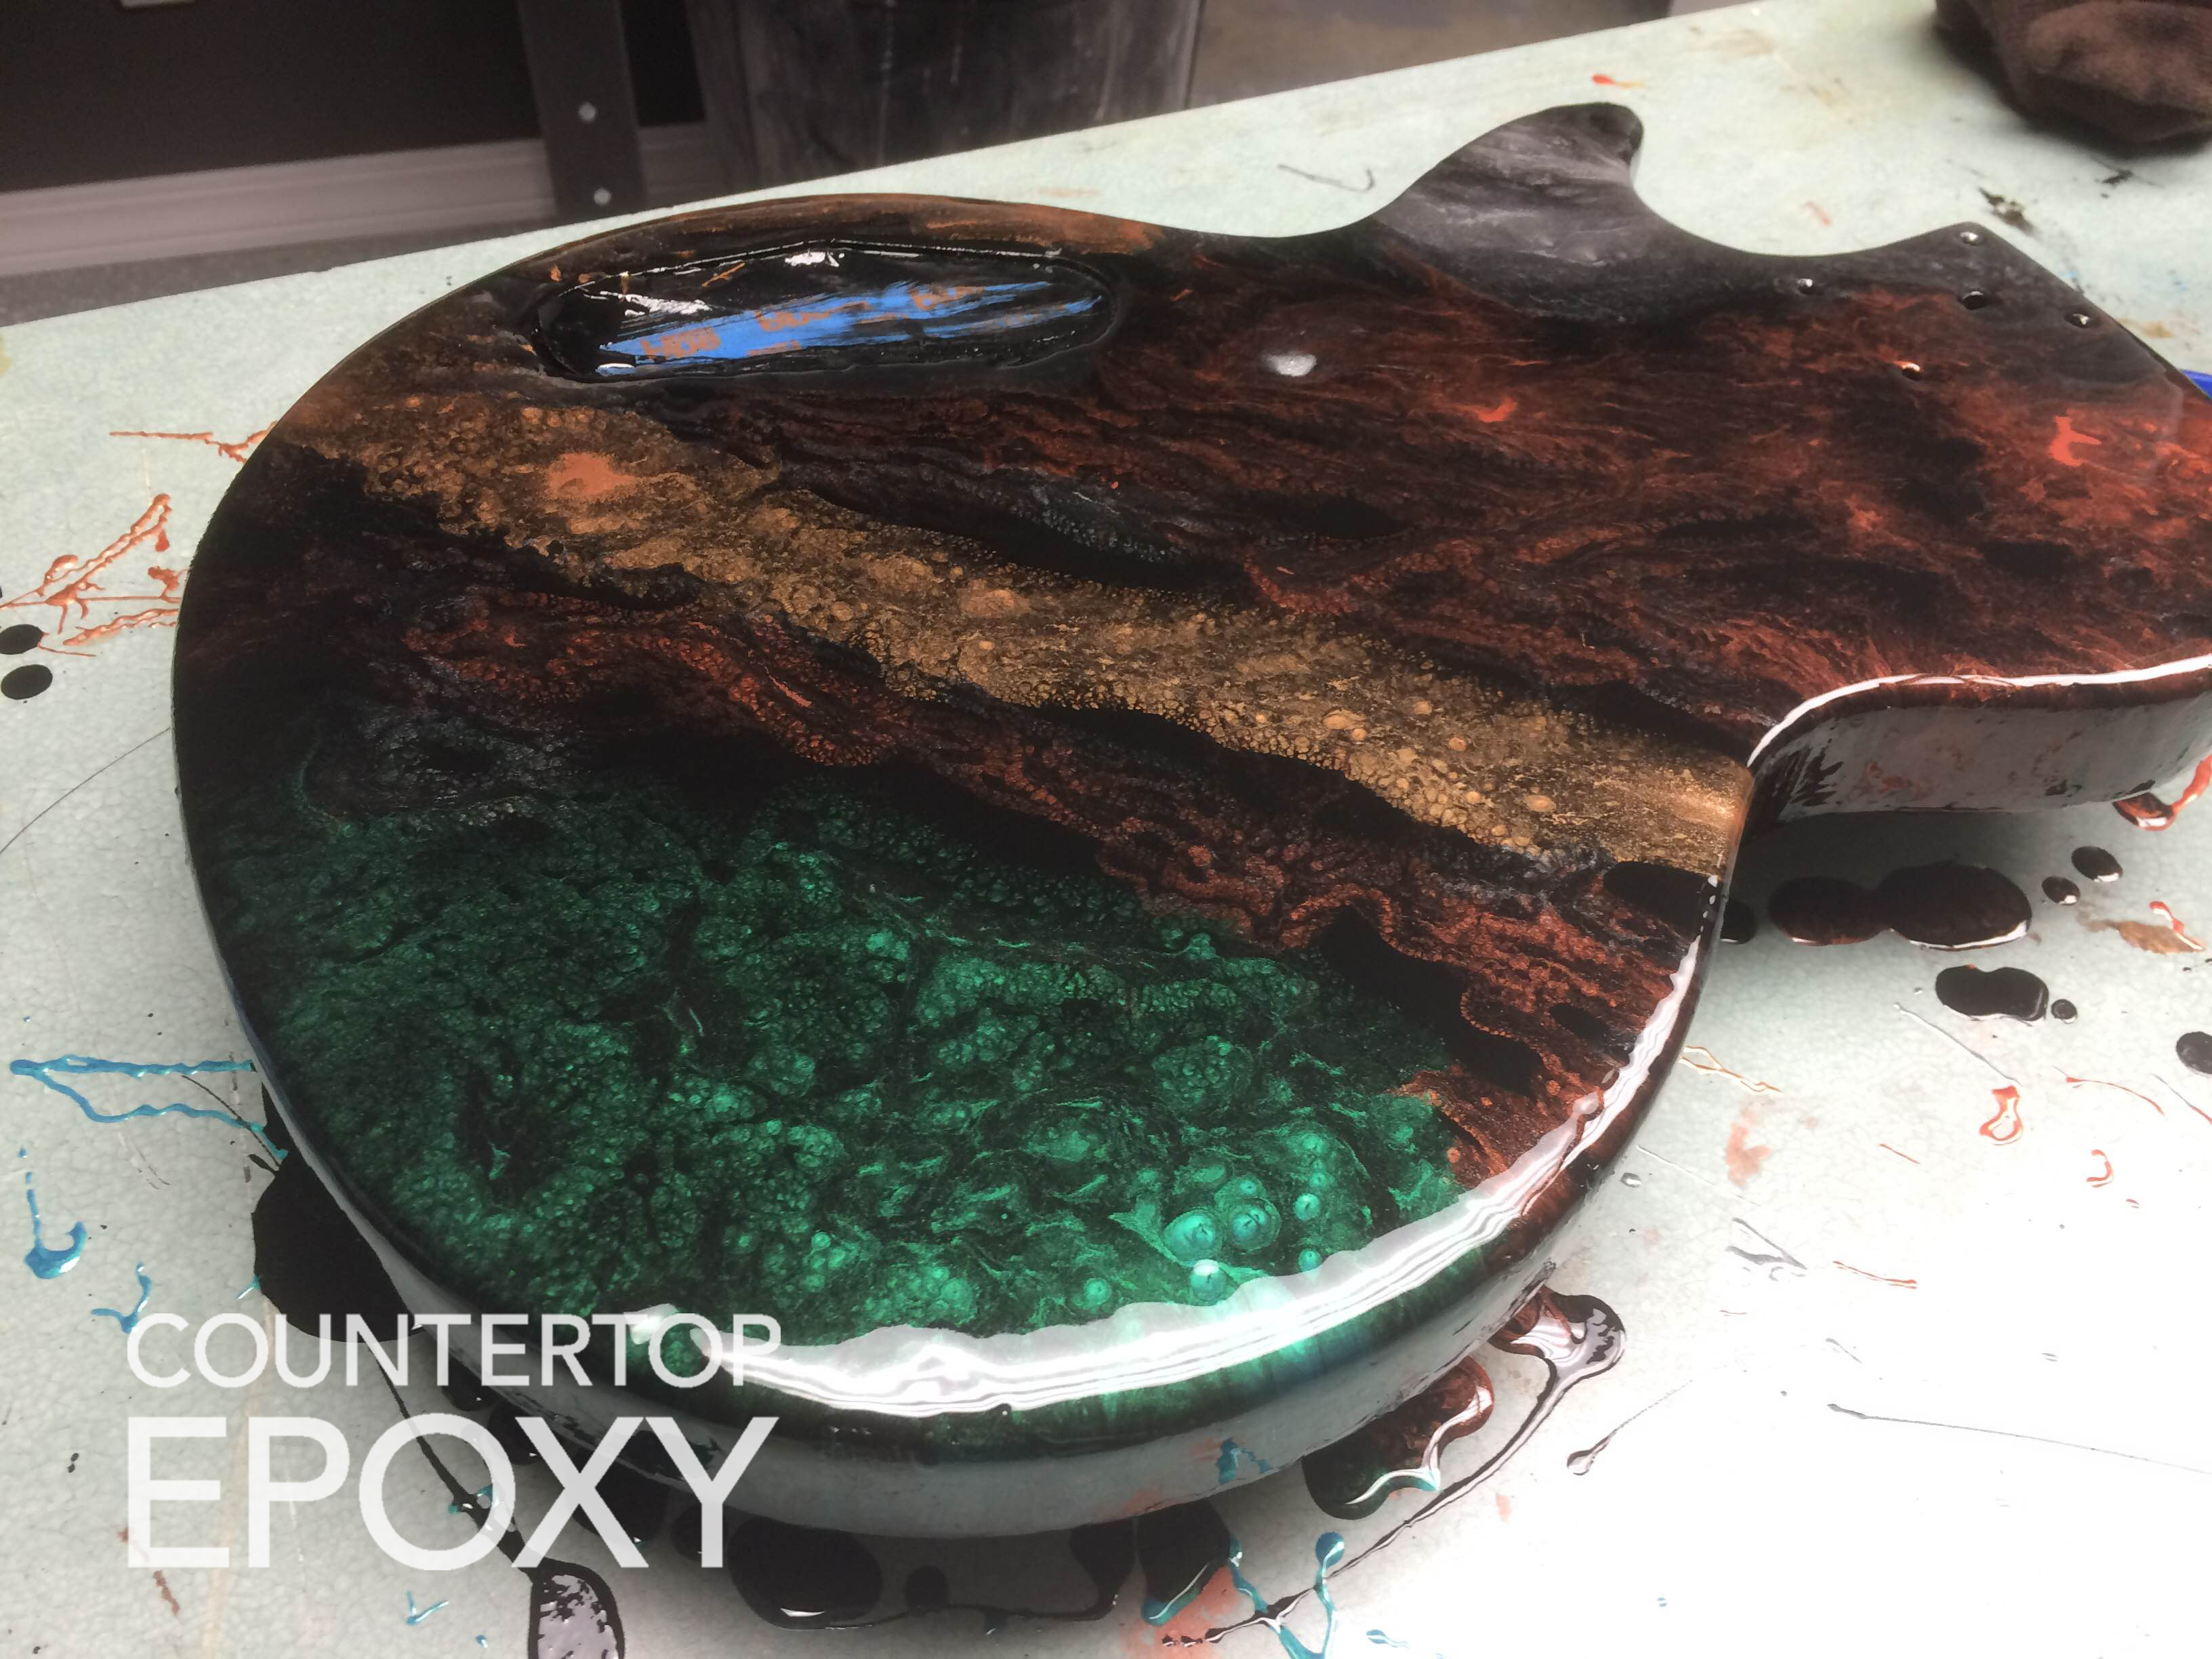 fx poxy epoxy color on electric guitar